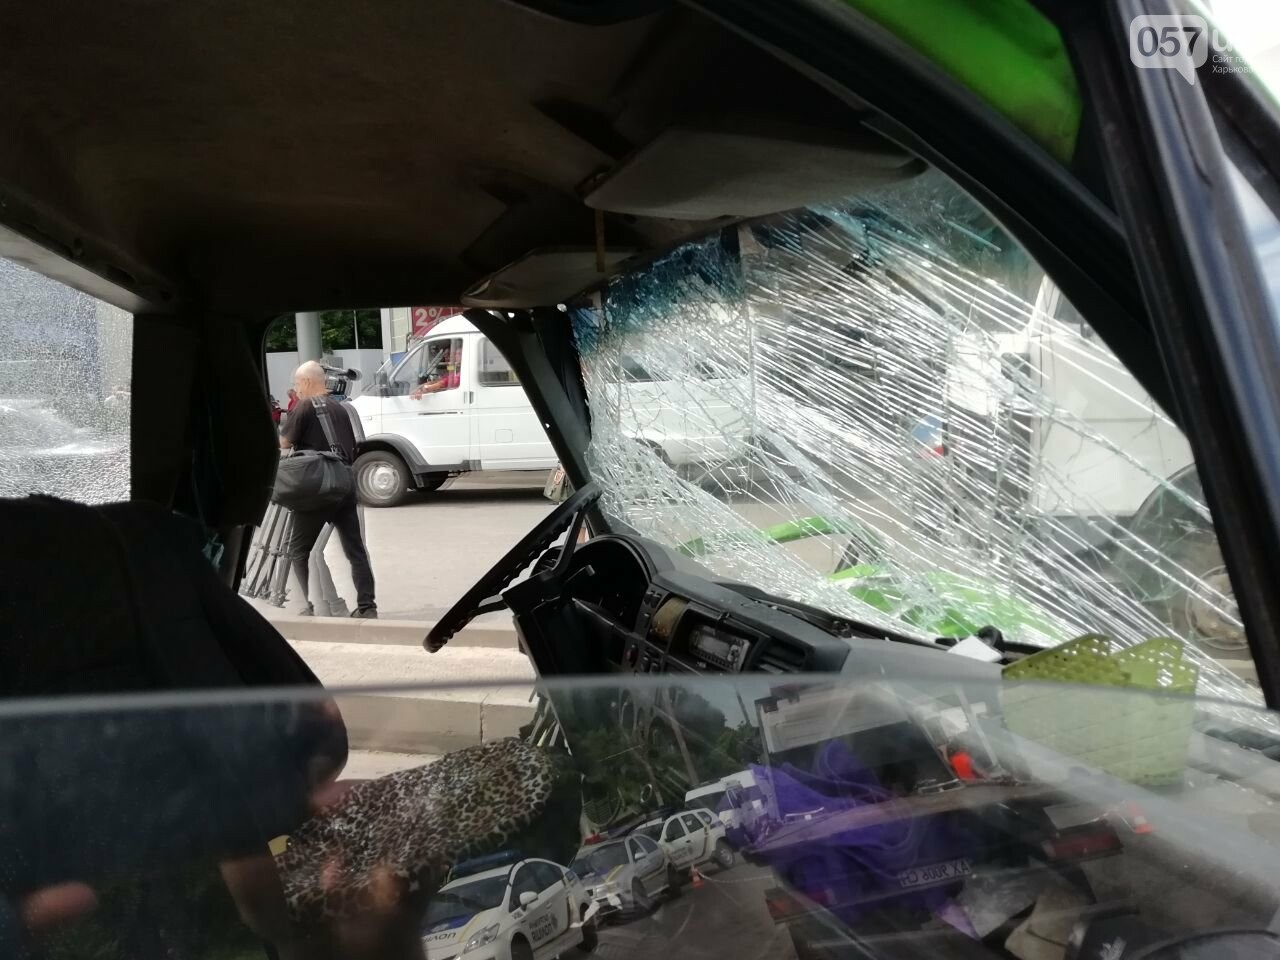 «Все сидели в крови»: подробности аварии на проспекте Тракторостроителей, - ФОТО, ВИДЕО, фото-12